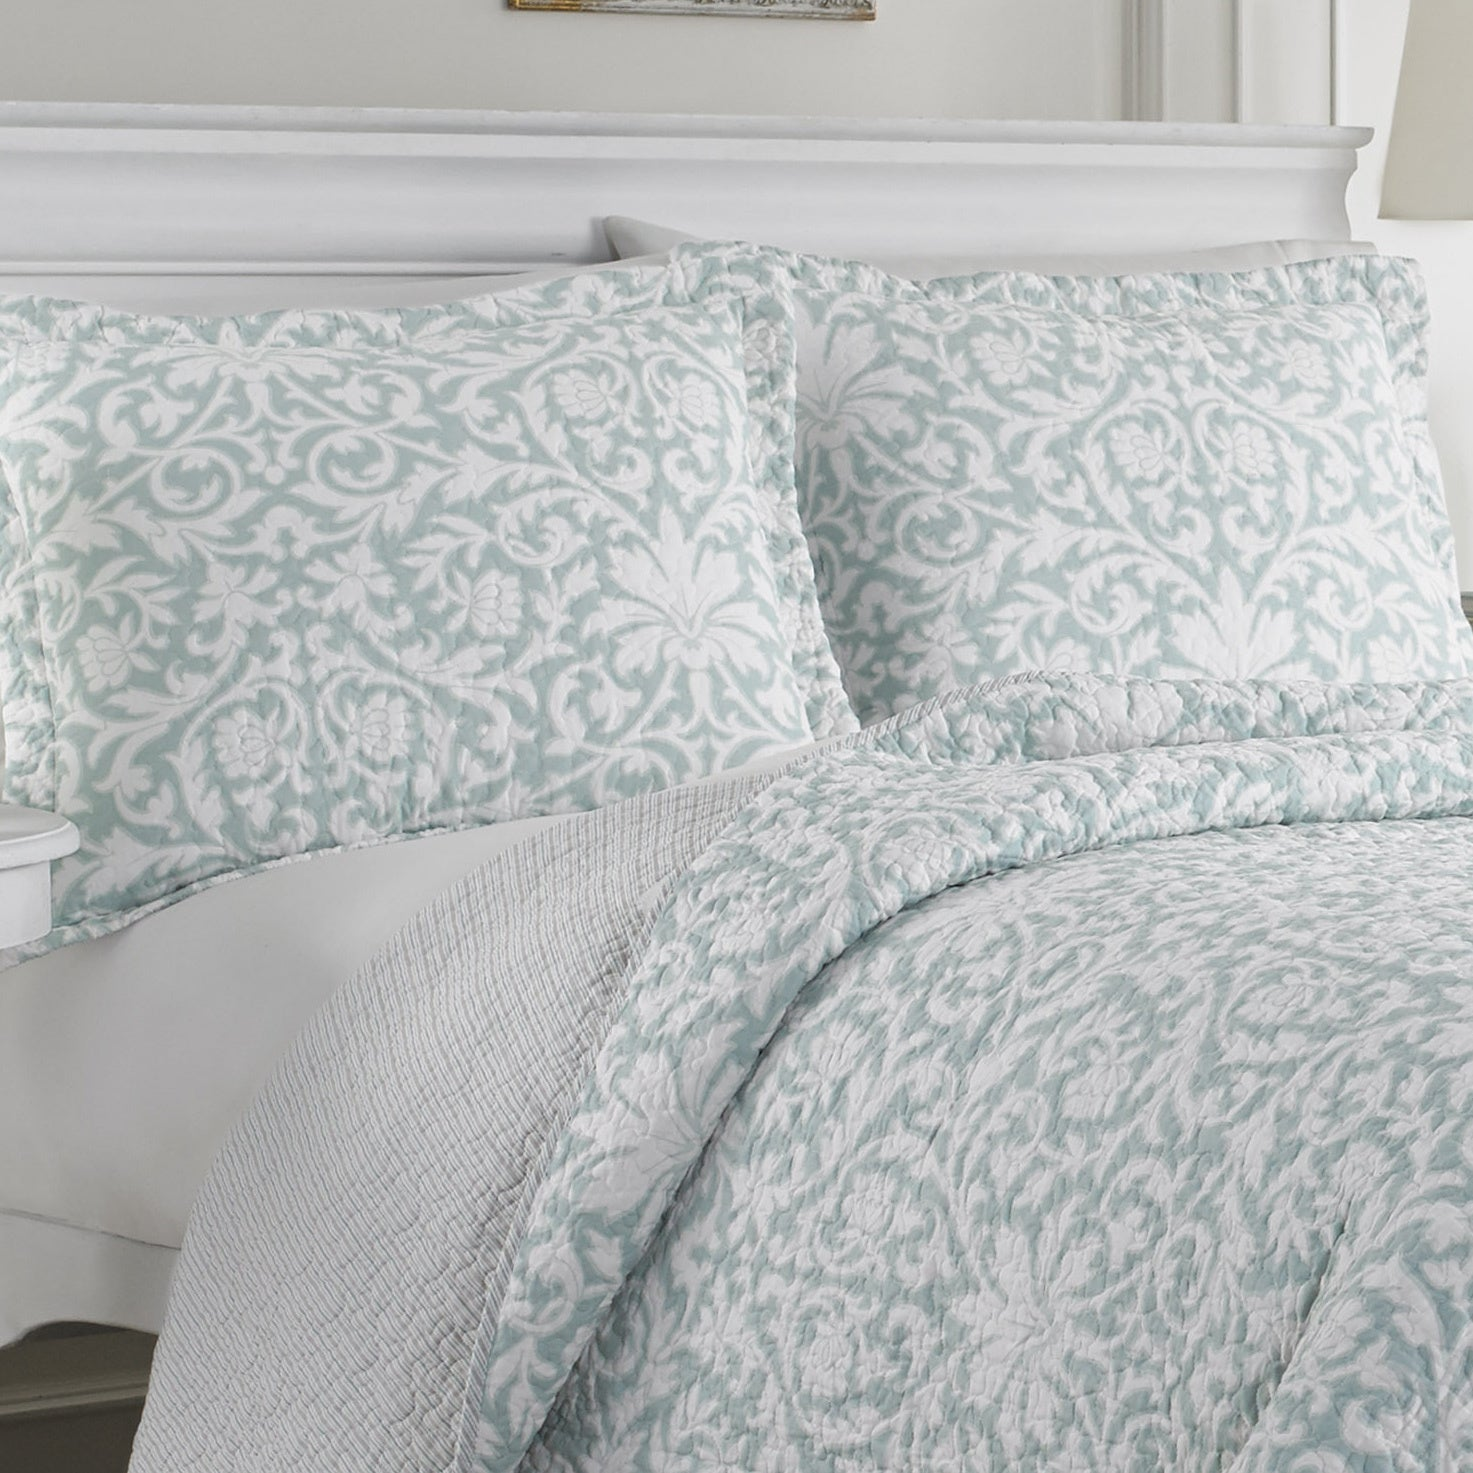 Laura Ashley Mia Reversible 3 Piece Cotton Quilt Set On Sale Overstock 10011790